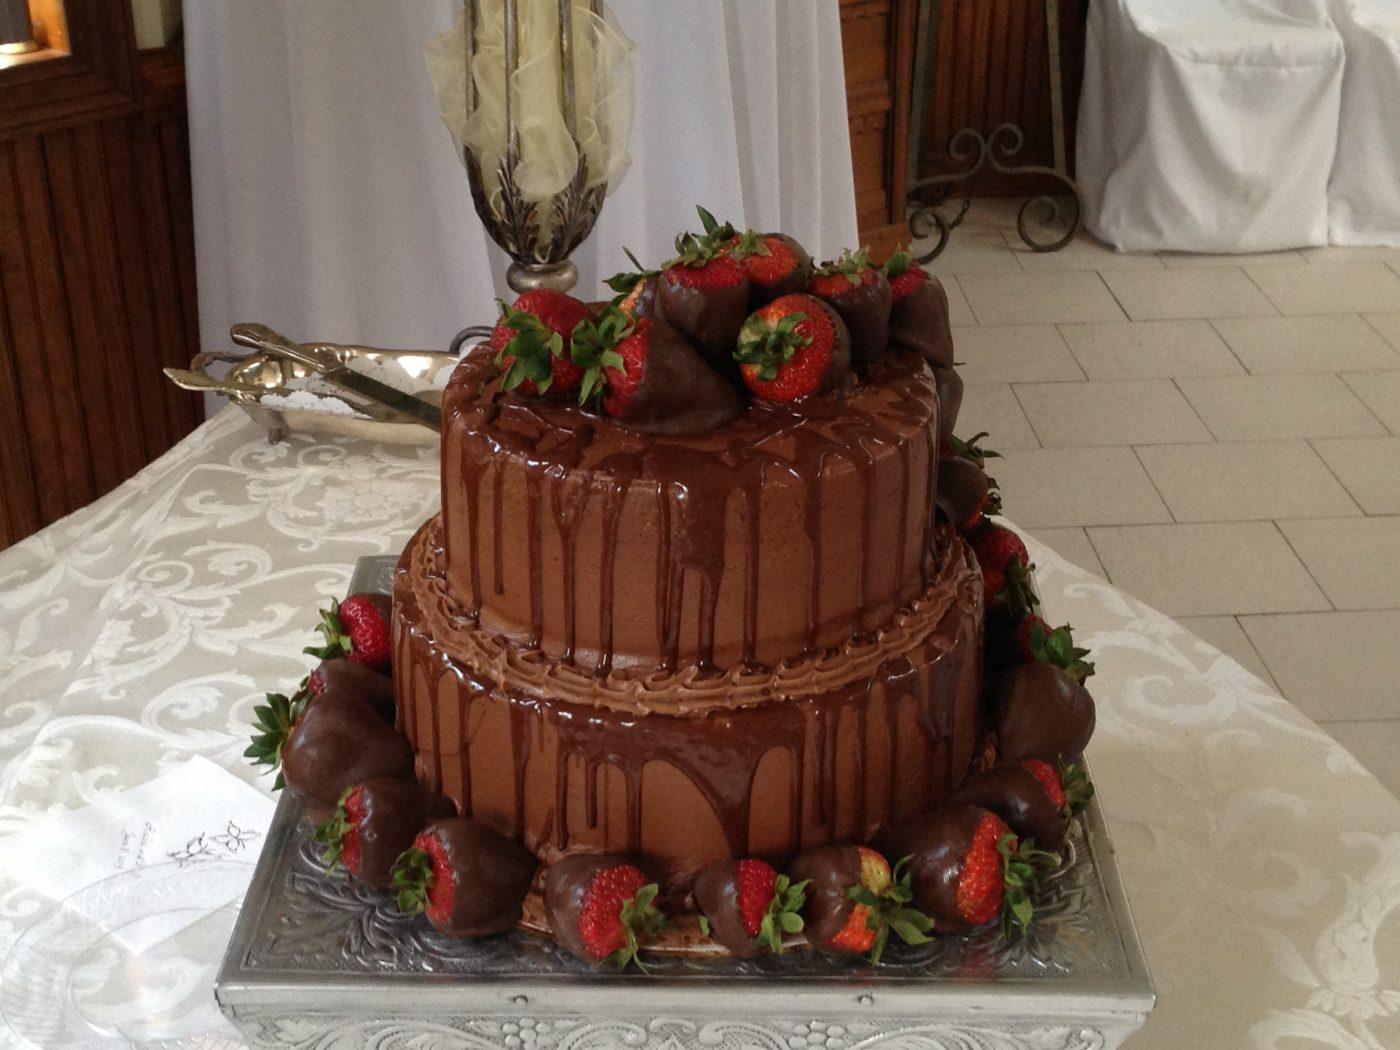 Chocolate Groom's Cake with Chocolate Covered Strawberries